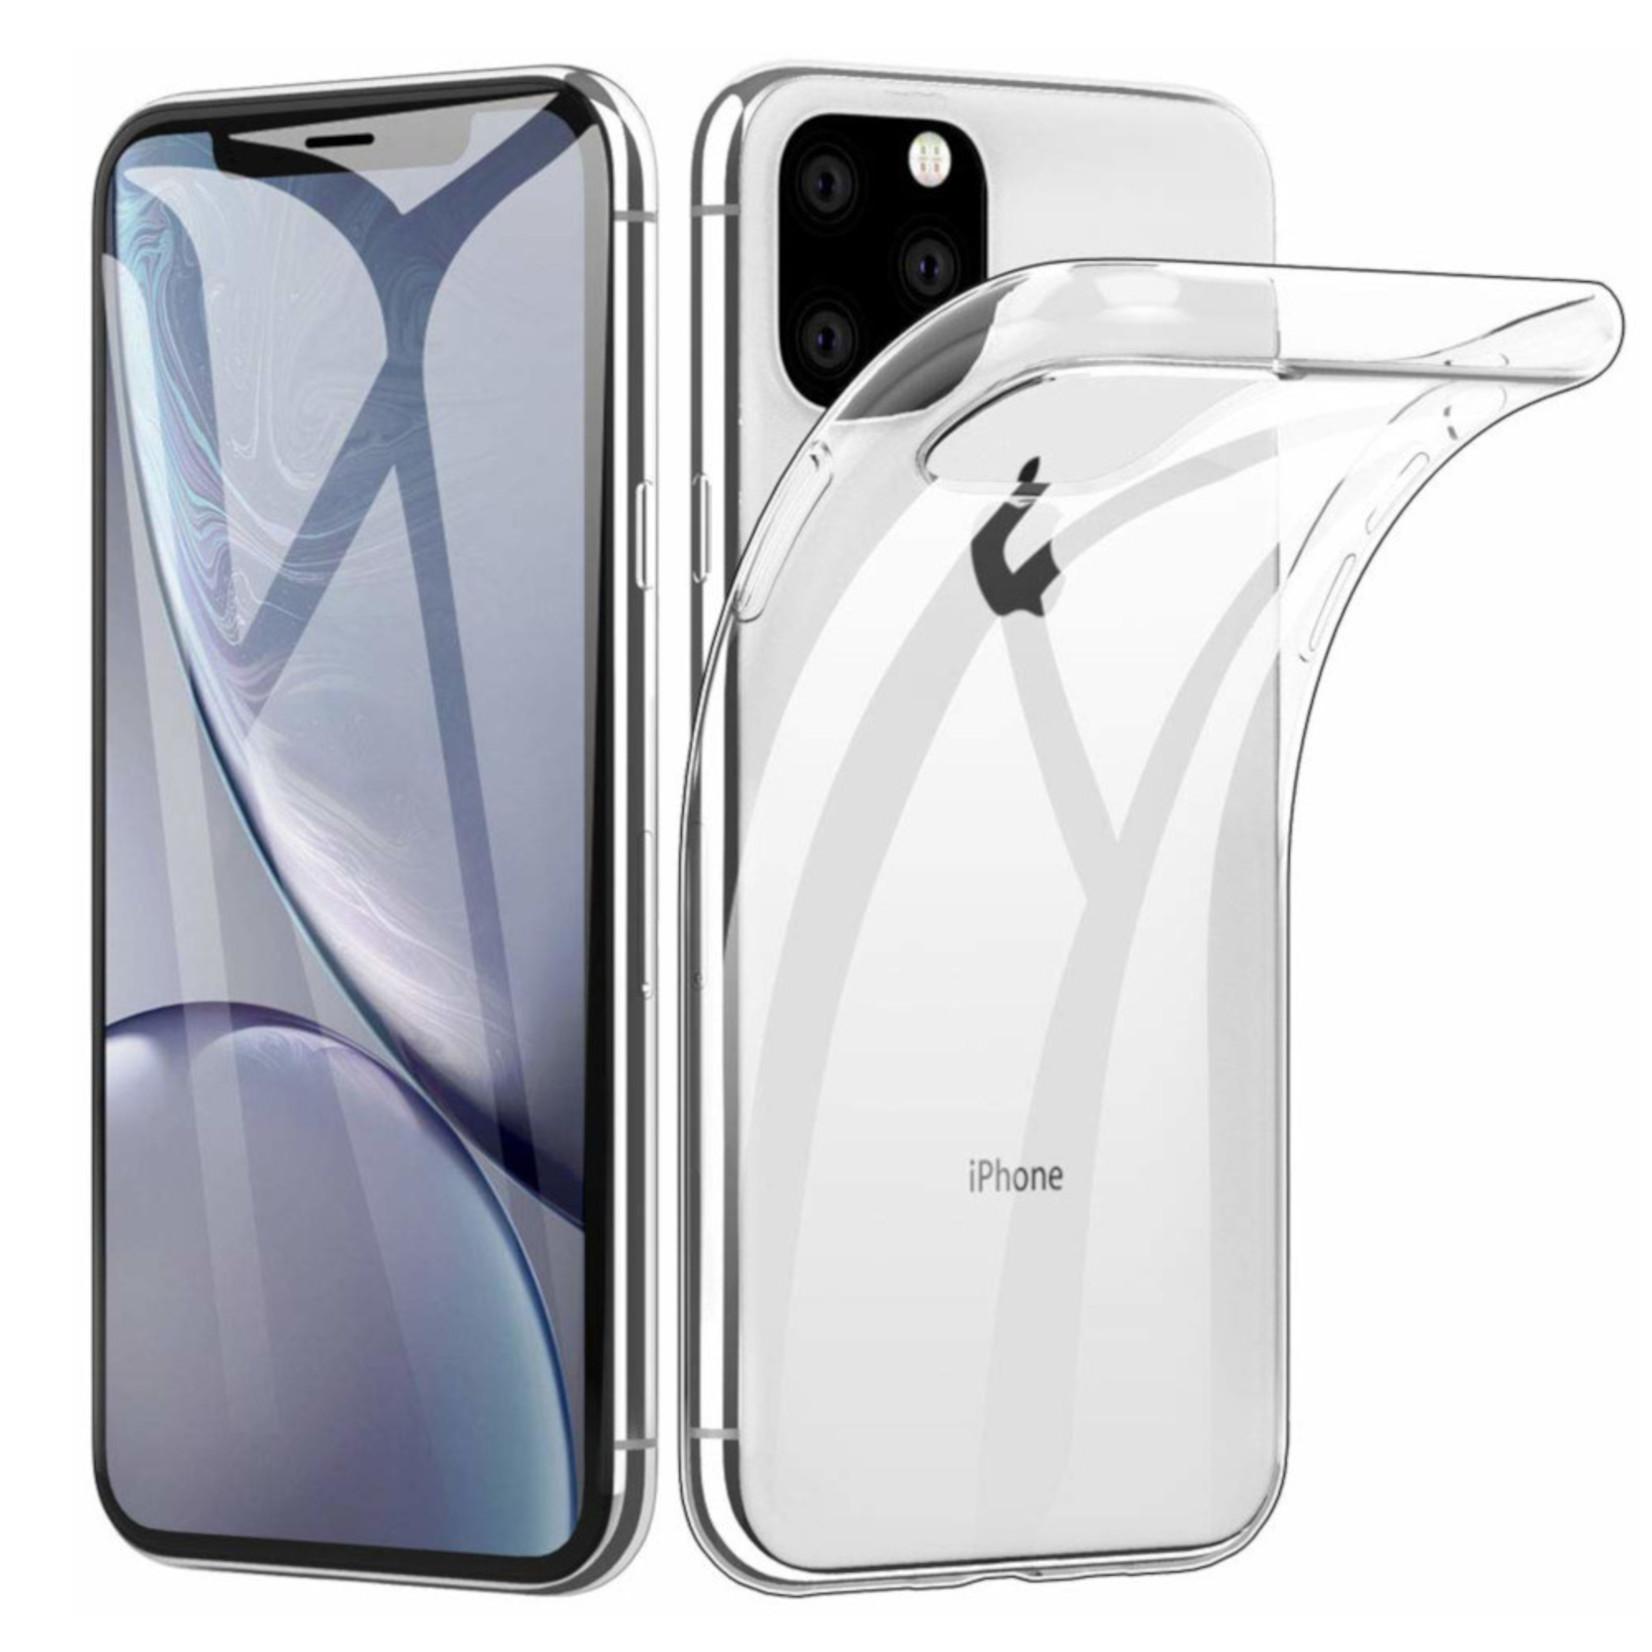 Colorfone Hoesje CoolSkin3T voor Apple iPhone 11 Pro Max (6.5) Tr. Wit